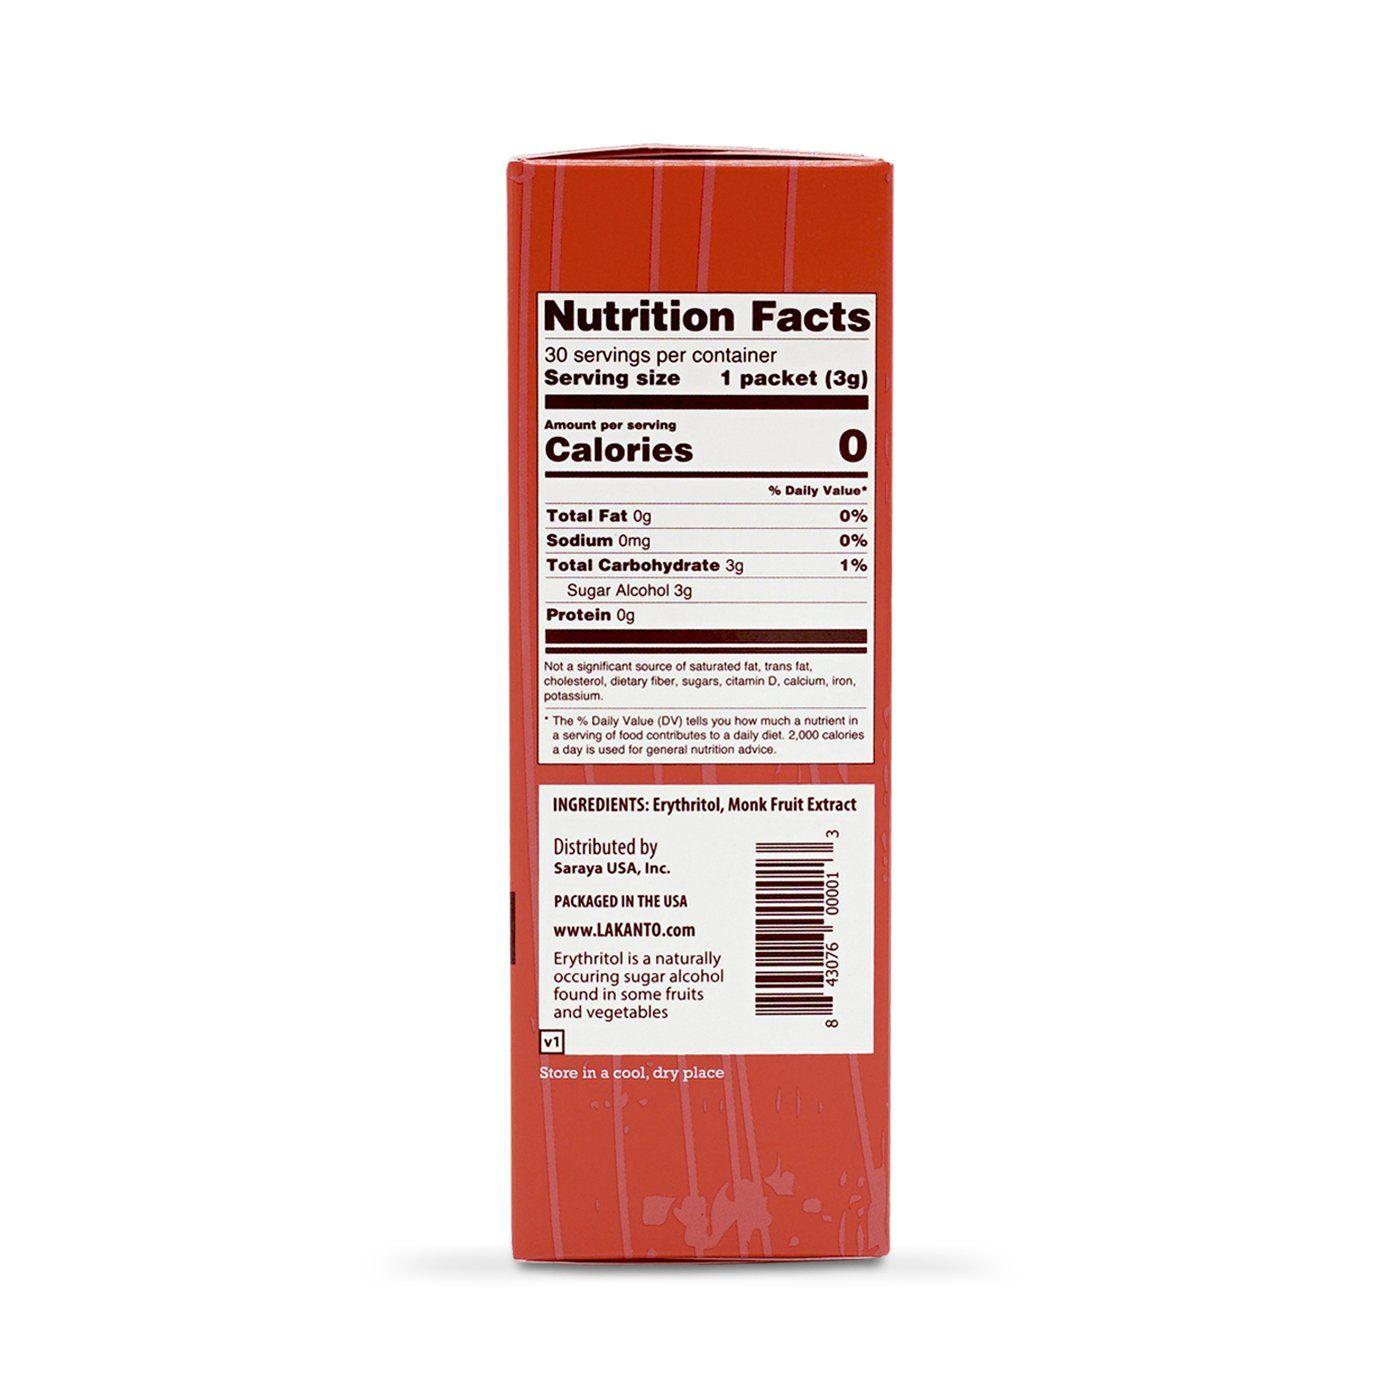 Golden Monkfruit 2 1 Sweetener Packets Lakanto Fruit Sugar Free Treats